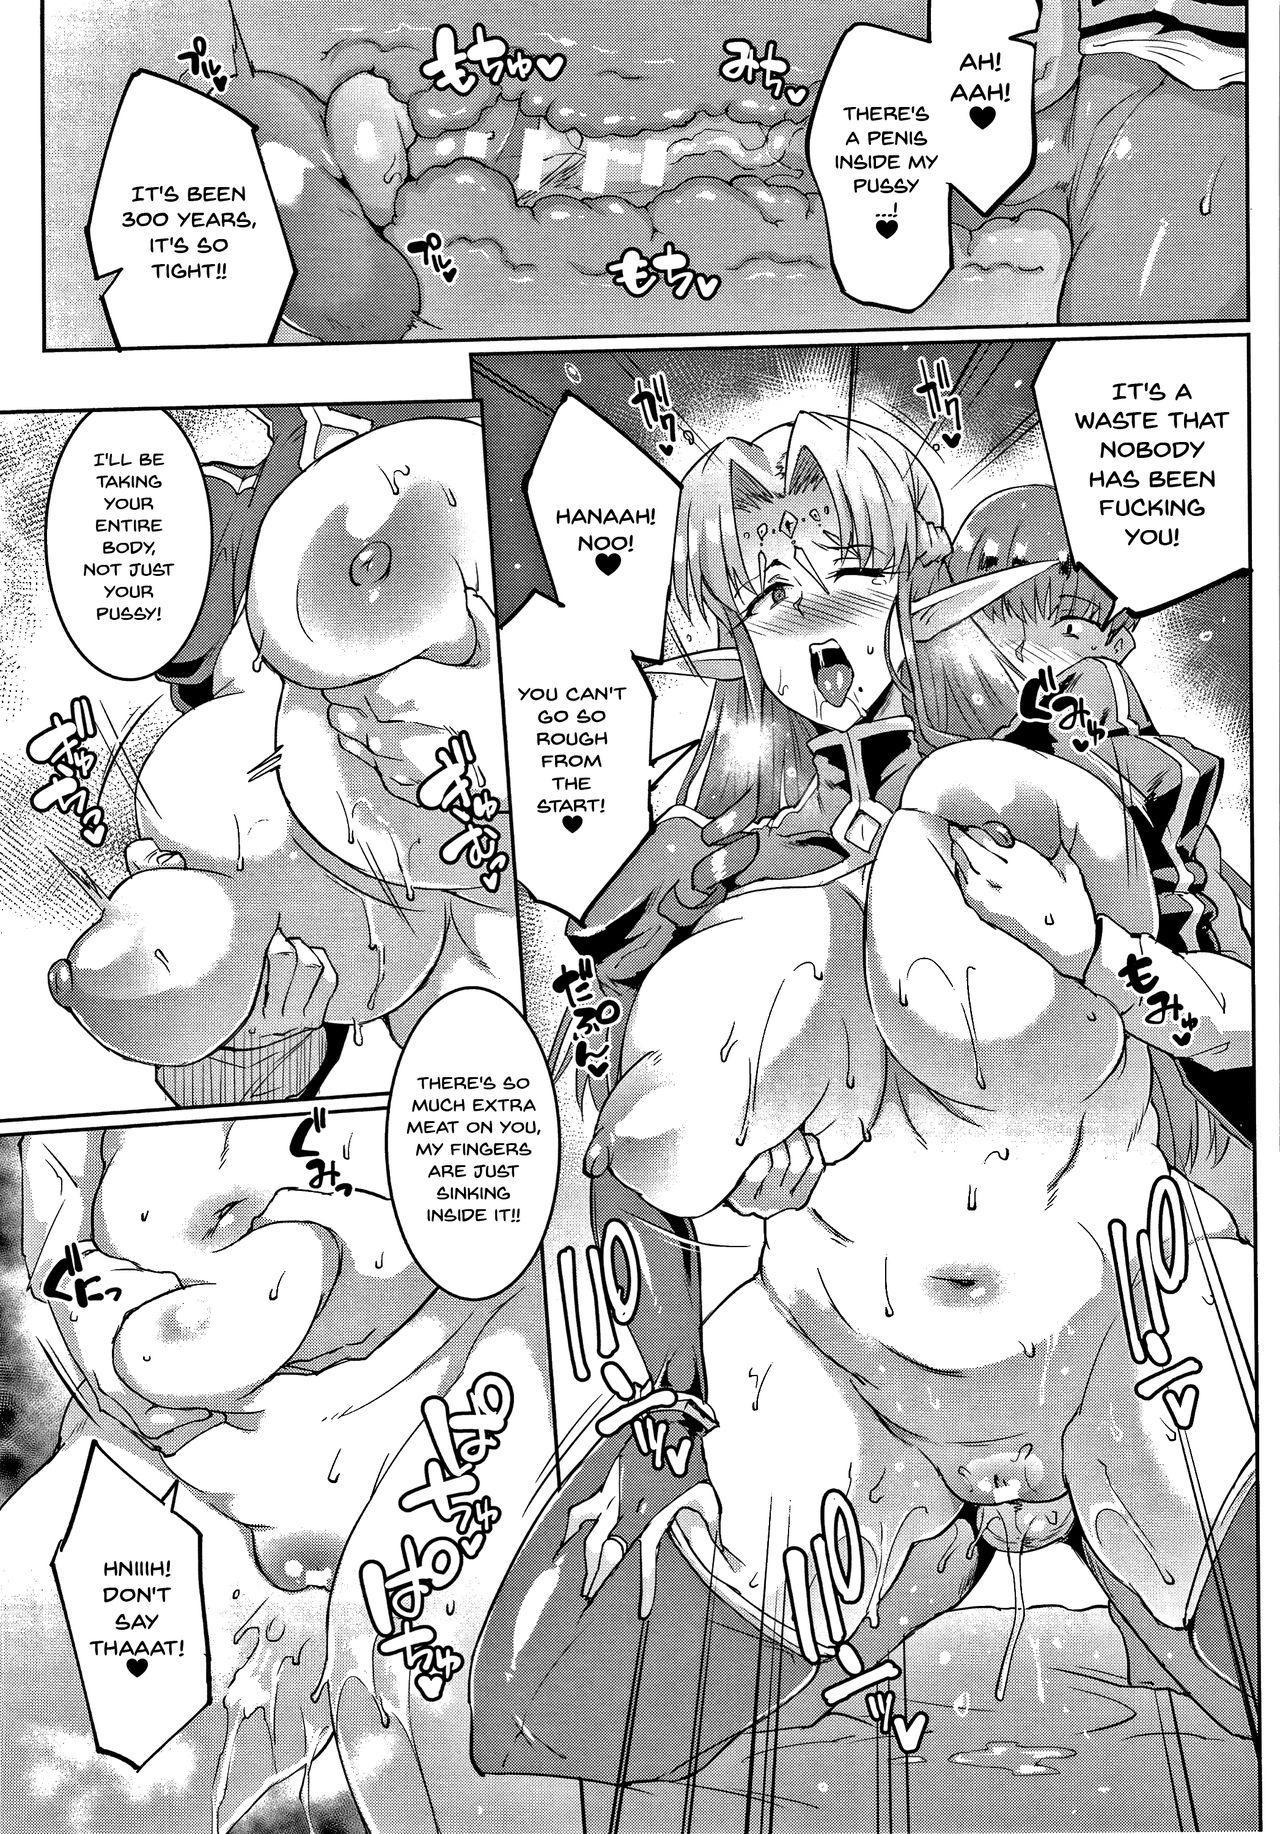 [Fan no Hitori] Sennen Reijou ~My Lady, My Master~  Ch.1-6 [English] {Doujins.com} 45